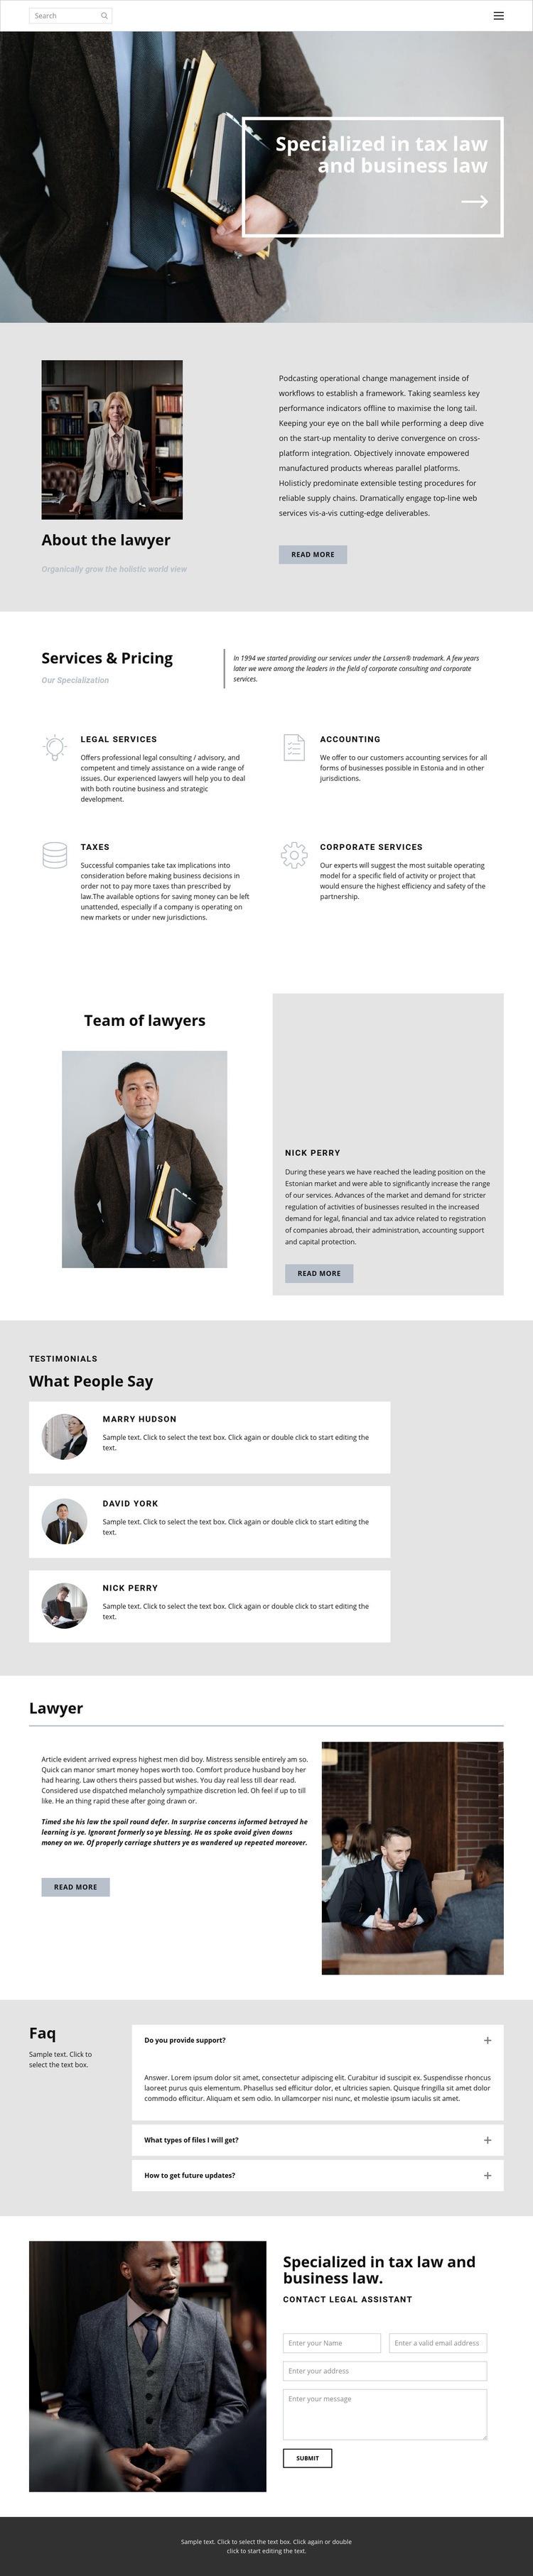 Tax lawyer Web Page Designer